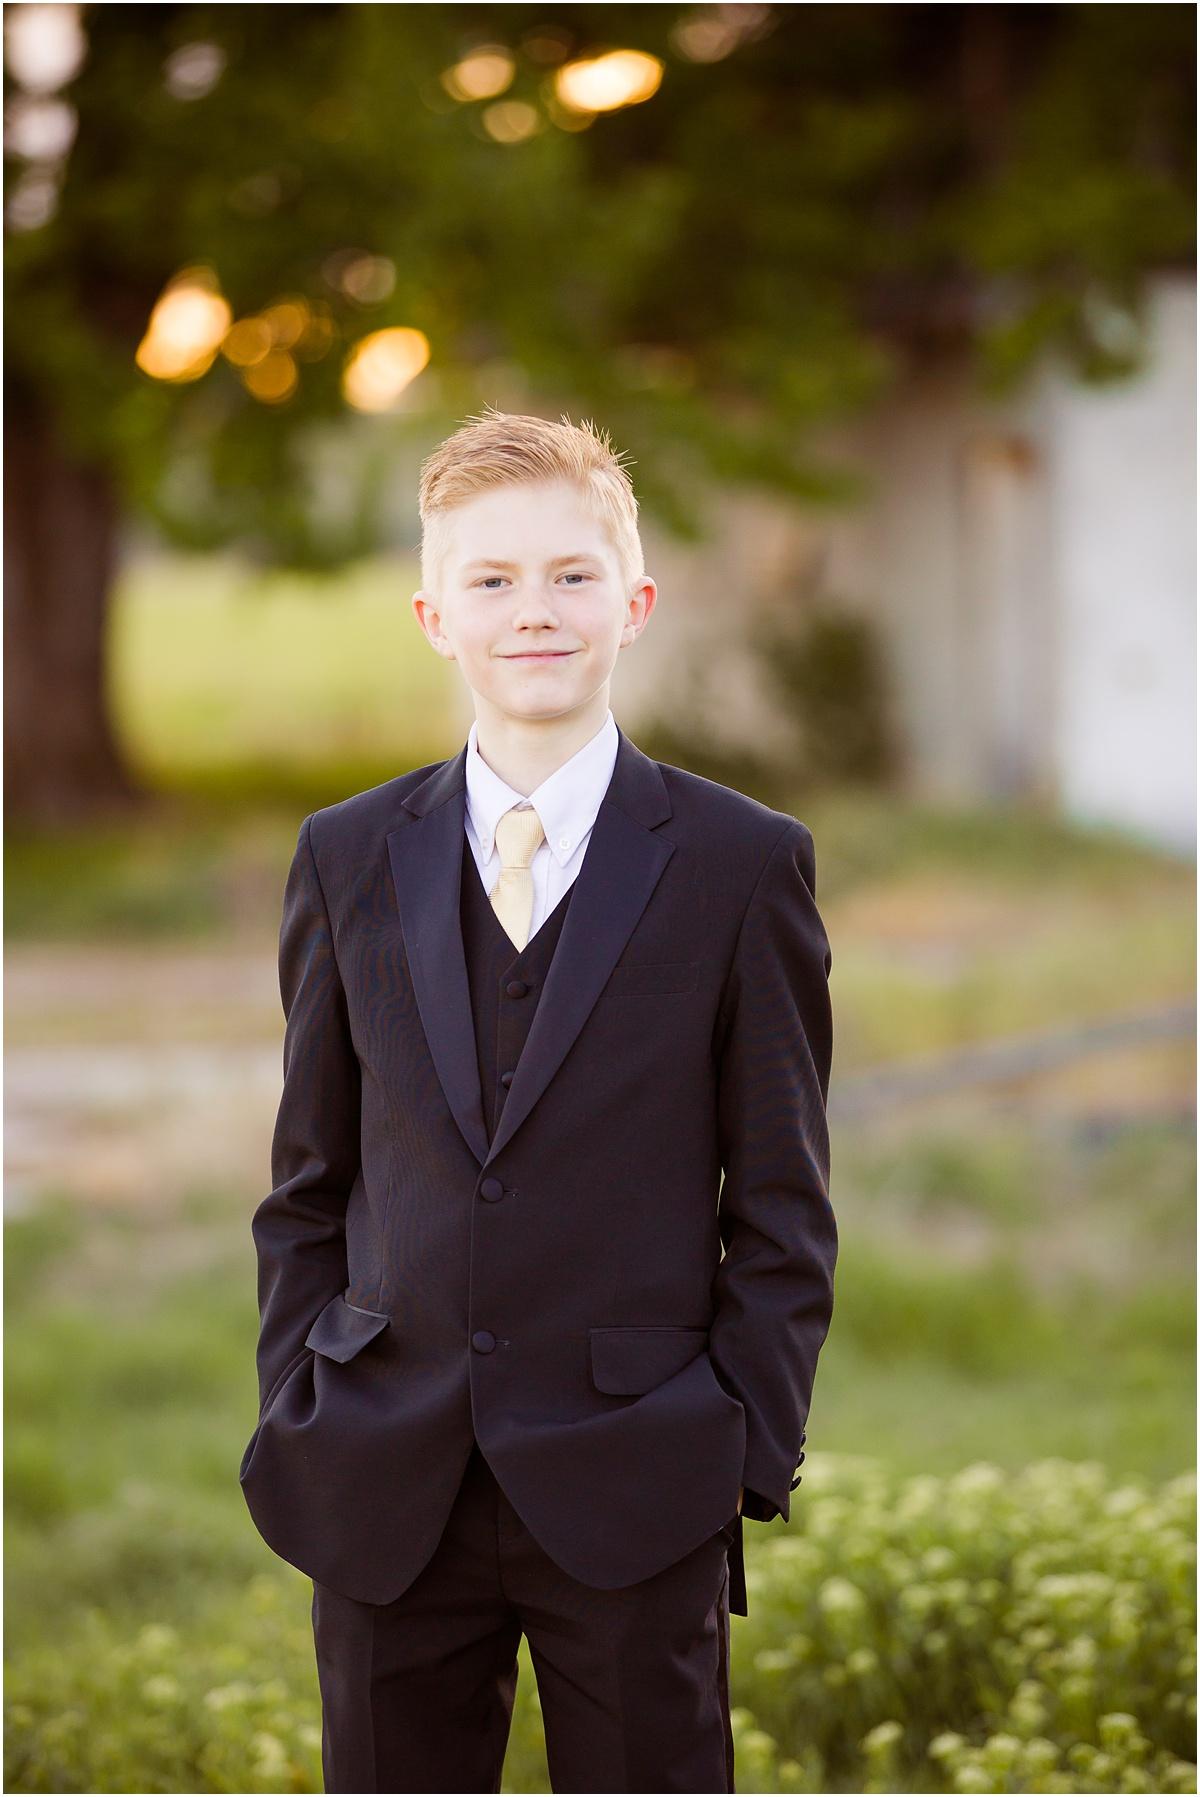 Portraits_Child Photography_Meridian Idaho__Leah Southwick Photography_0059.jpg